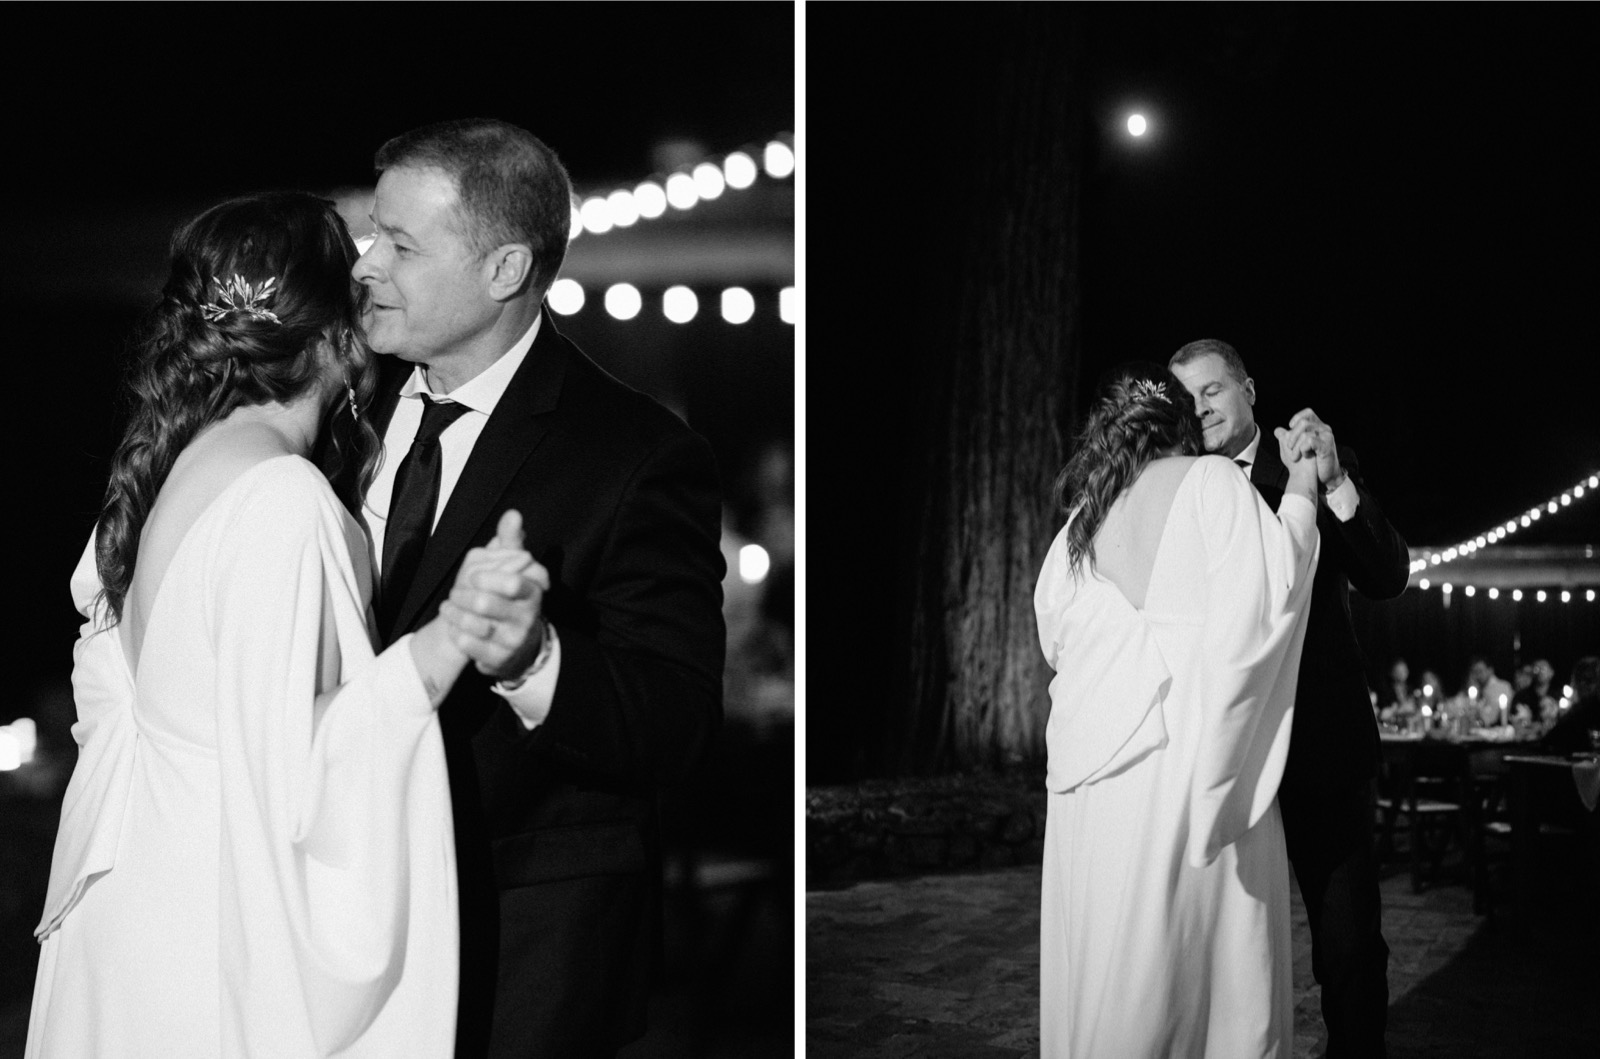 127_Emily & Jeff Wedding 1101_Emily & Jeff Wedding 1094_the-waterfall-lodge_forest_wedding_ben-lomond_intimate